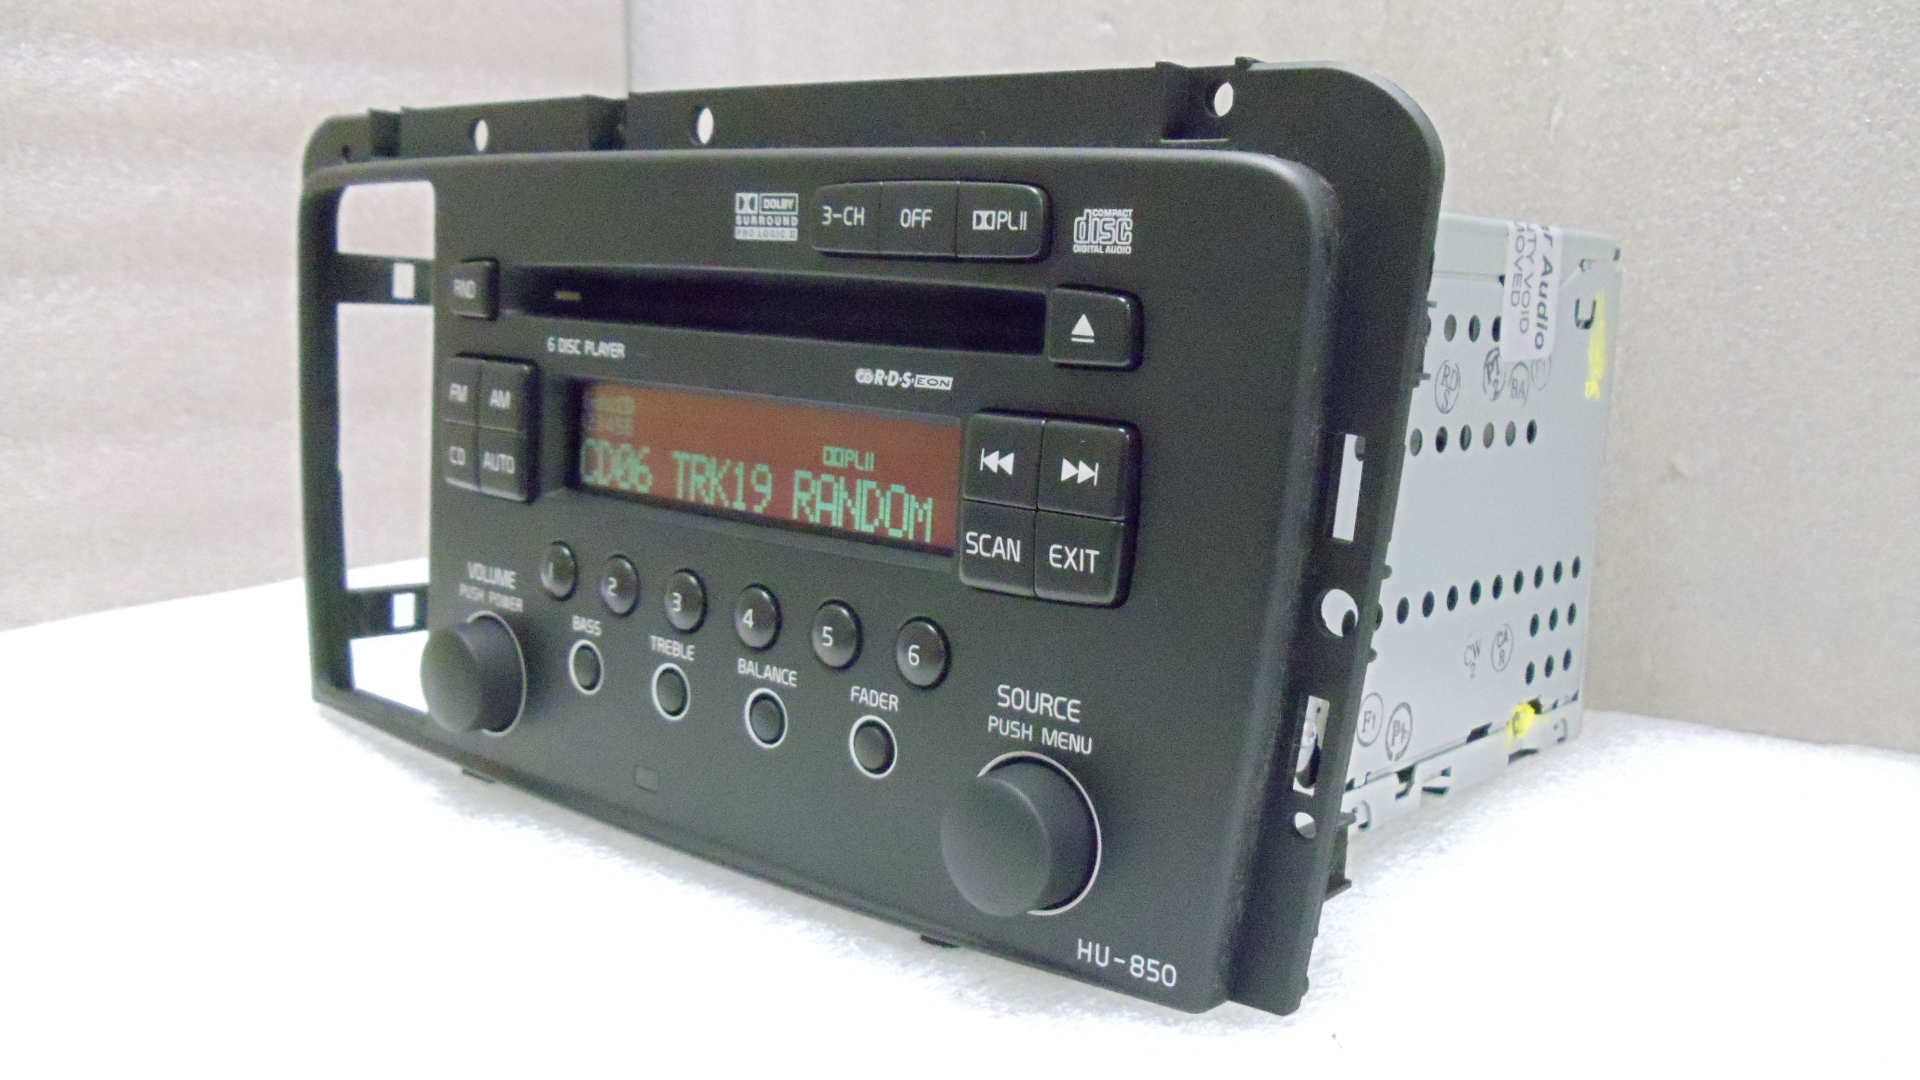 05 06 07 08 Volvo V70 S60 Rds Radio Stereo 6 Disc Changer